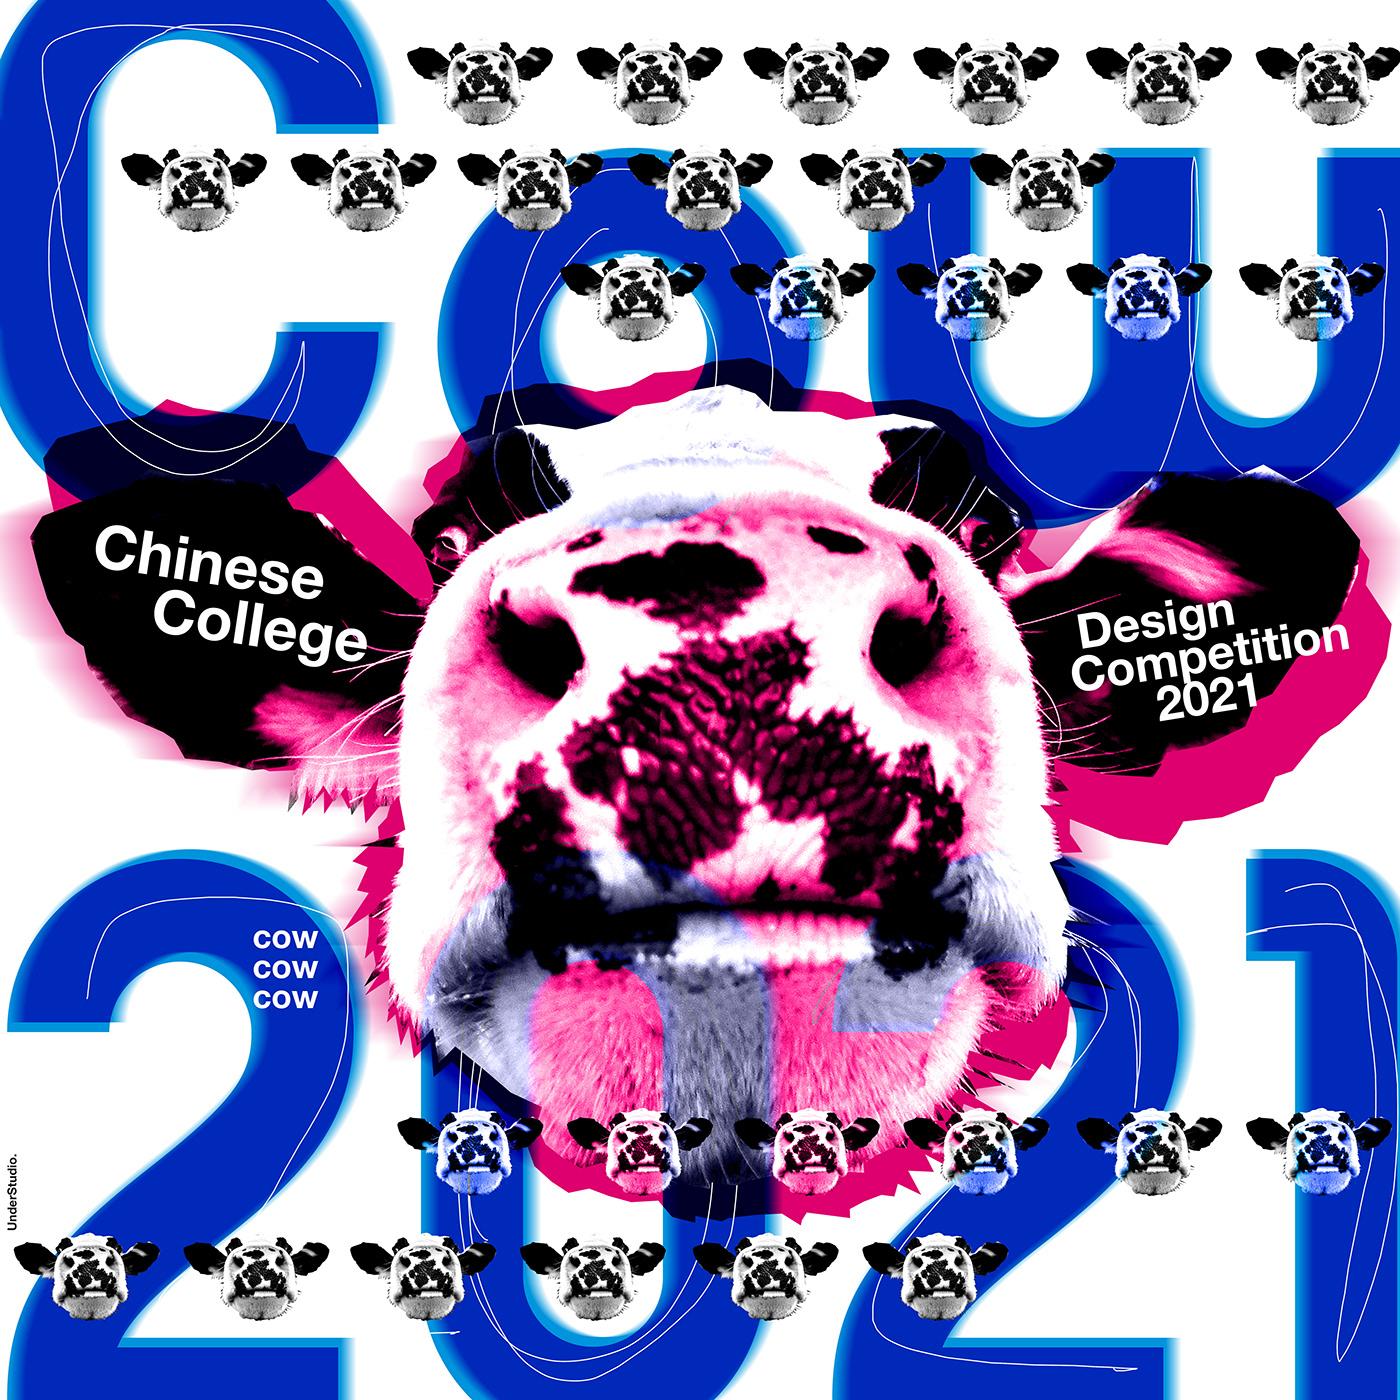 Chinese College design Francesco Mazzenga graphic design  Poster Exhibition 2020 Zodiac Cow